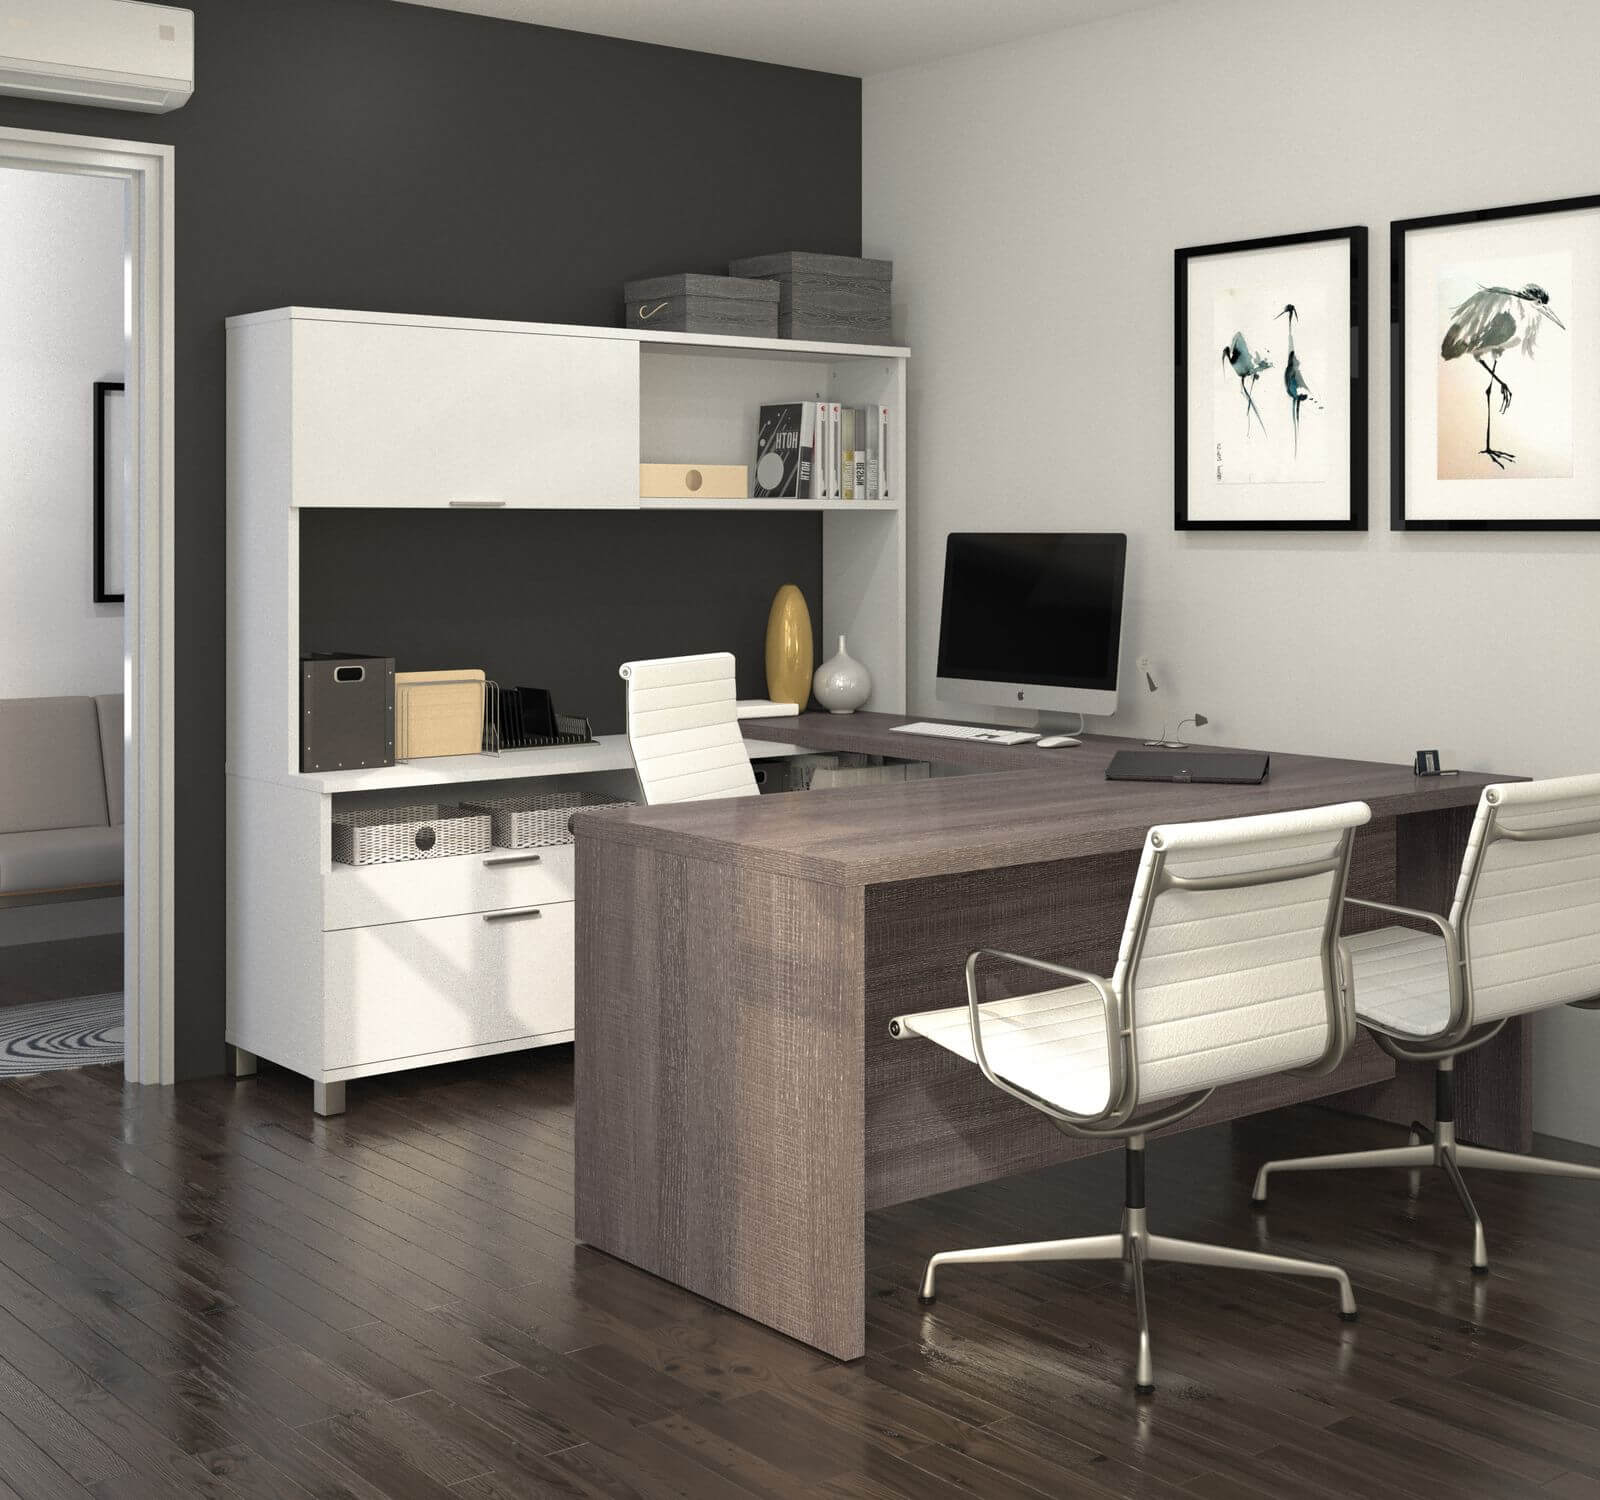 Bestar U or L-shaped desk